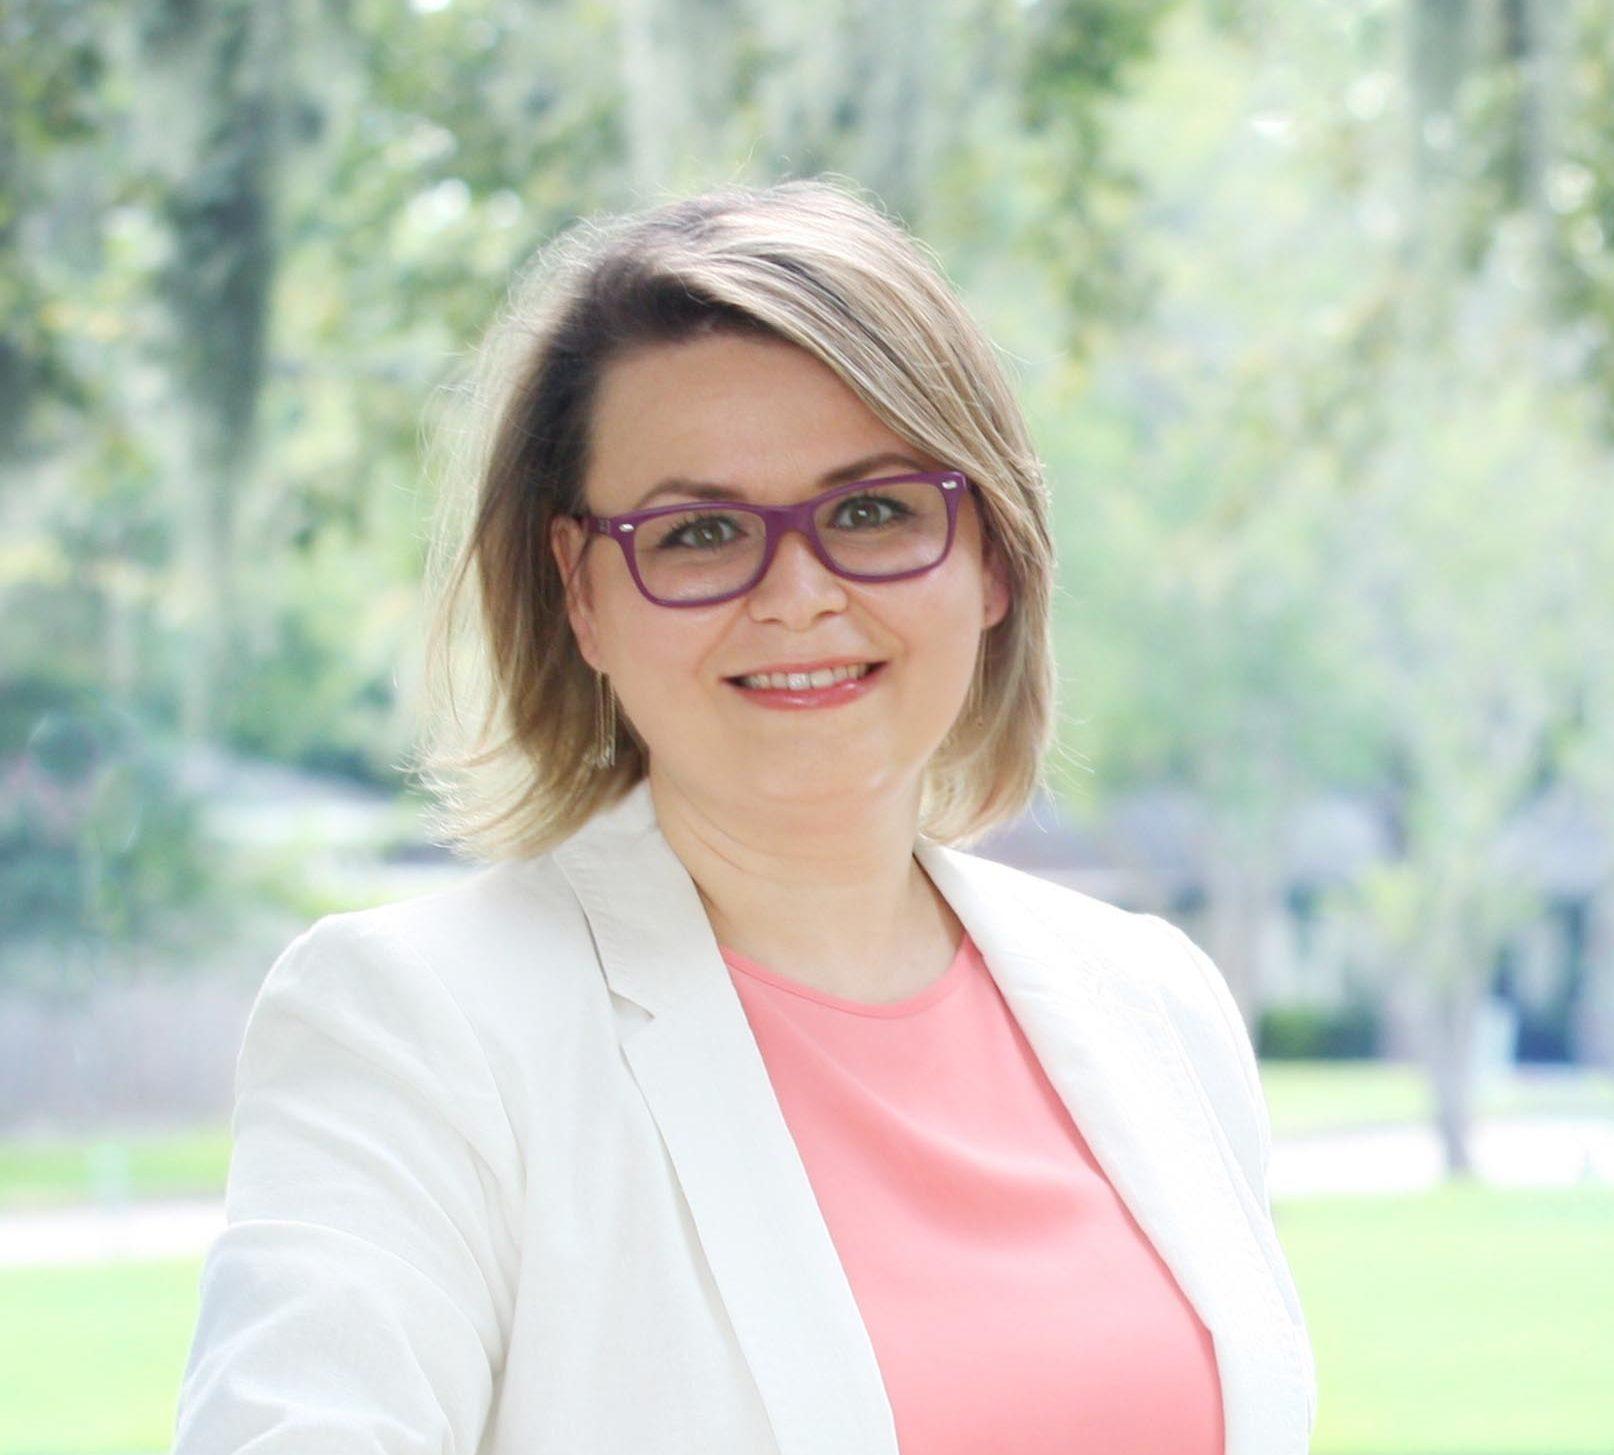 Karina Kaplun Pokusaeva Microbiota Probiotics